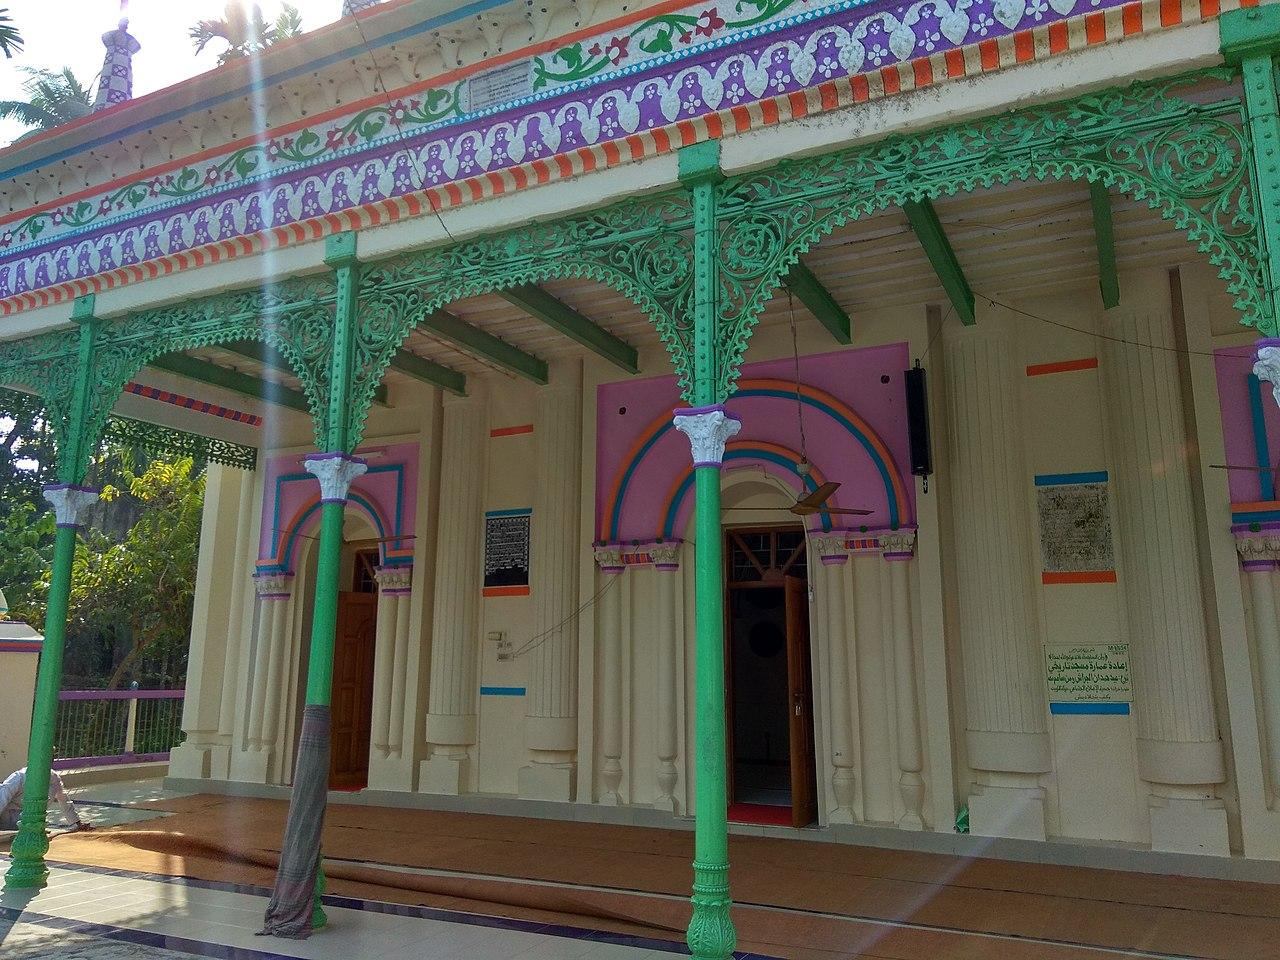 File:Ulania Zamindar Bari Masjid, Barisal (7).jpg